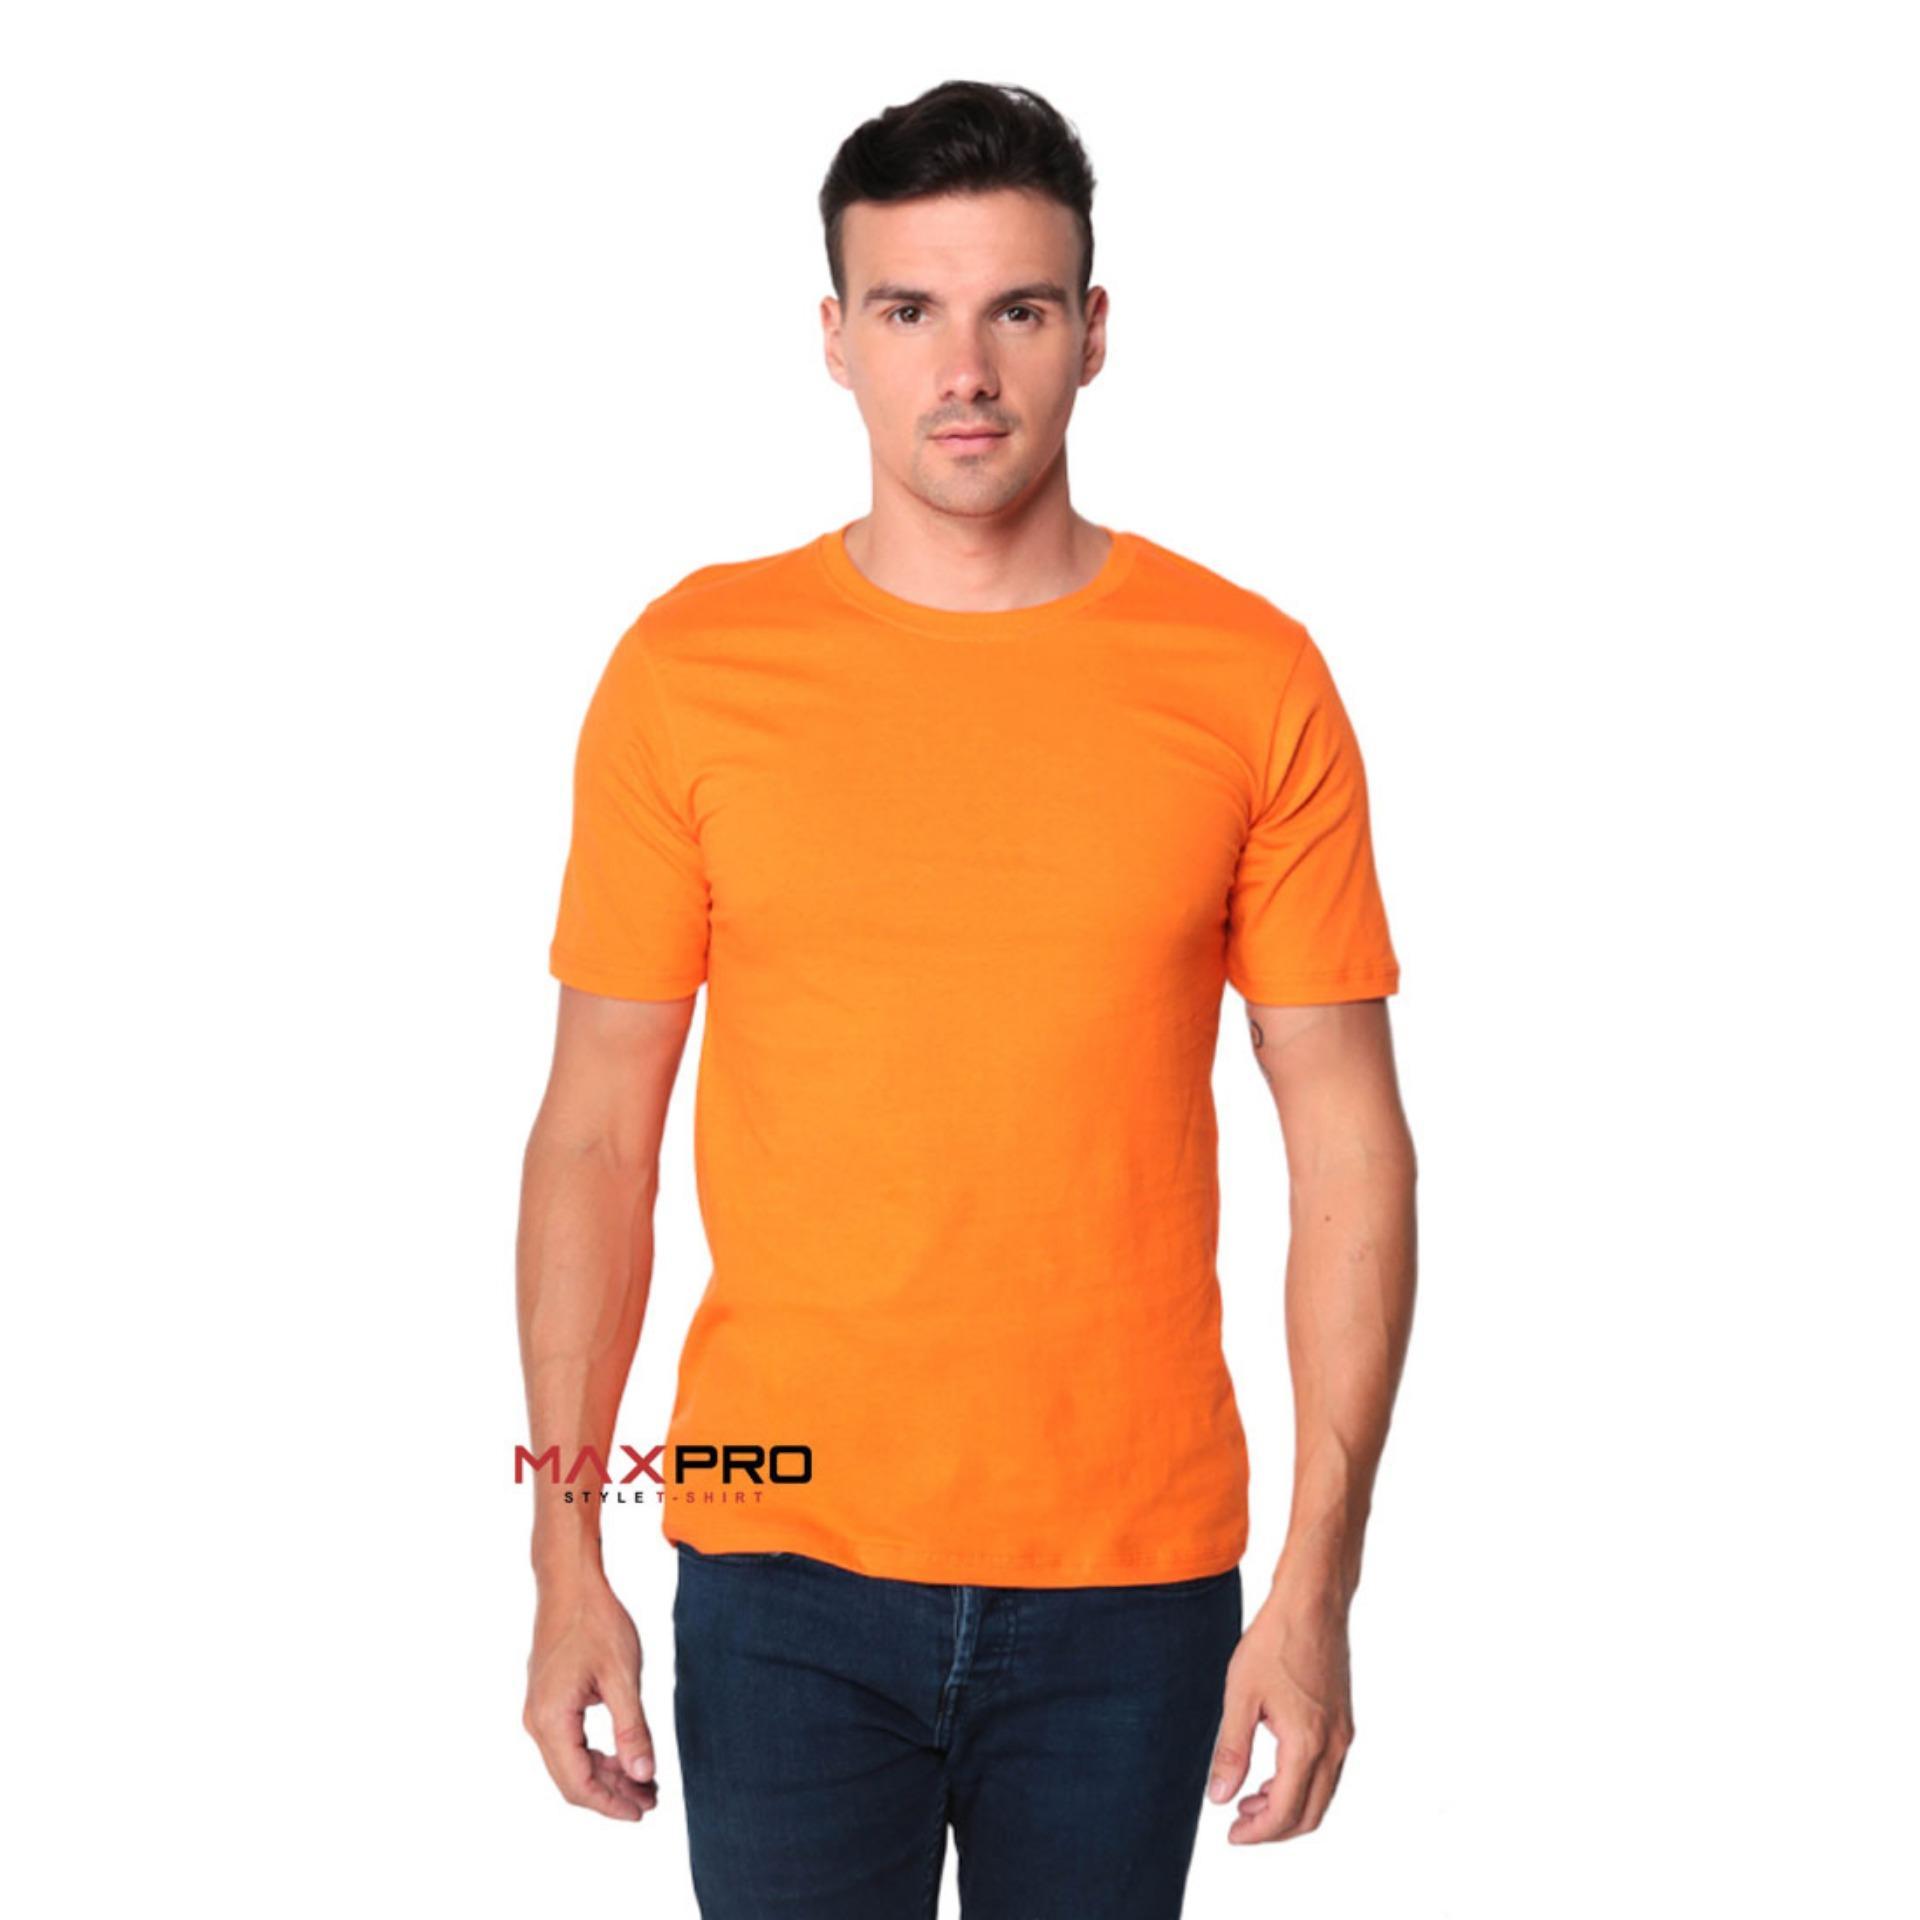 MaXPro Kaos Polos Pria Orange - T-Shirt Distro Cowok Tumblr Tee / Kaos Oblong / Kaos Distro / Kaos Couple / Baju Kaos Atasan Pria Oren